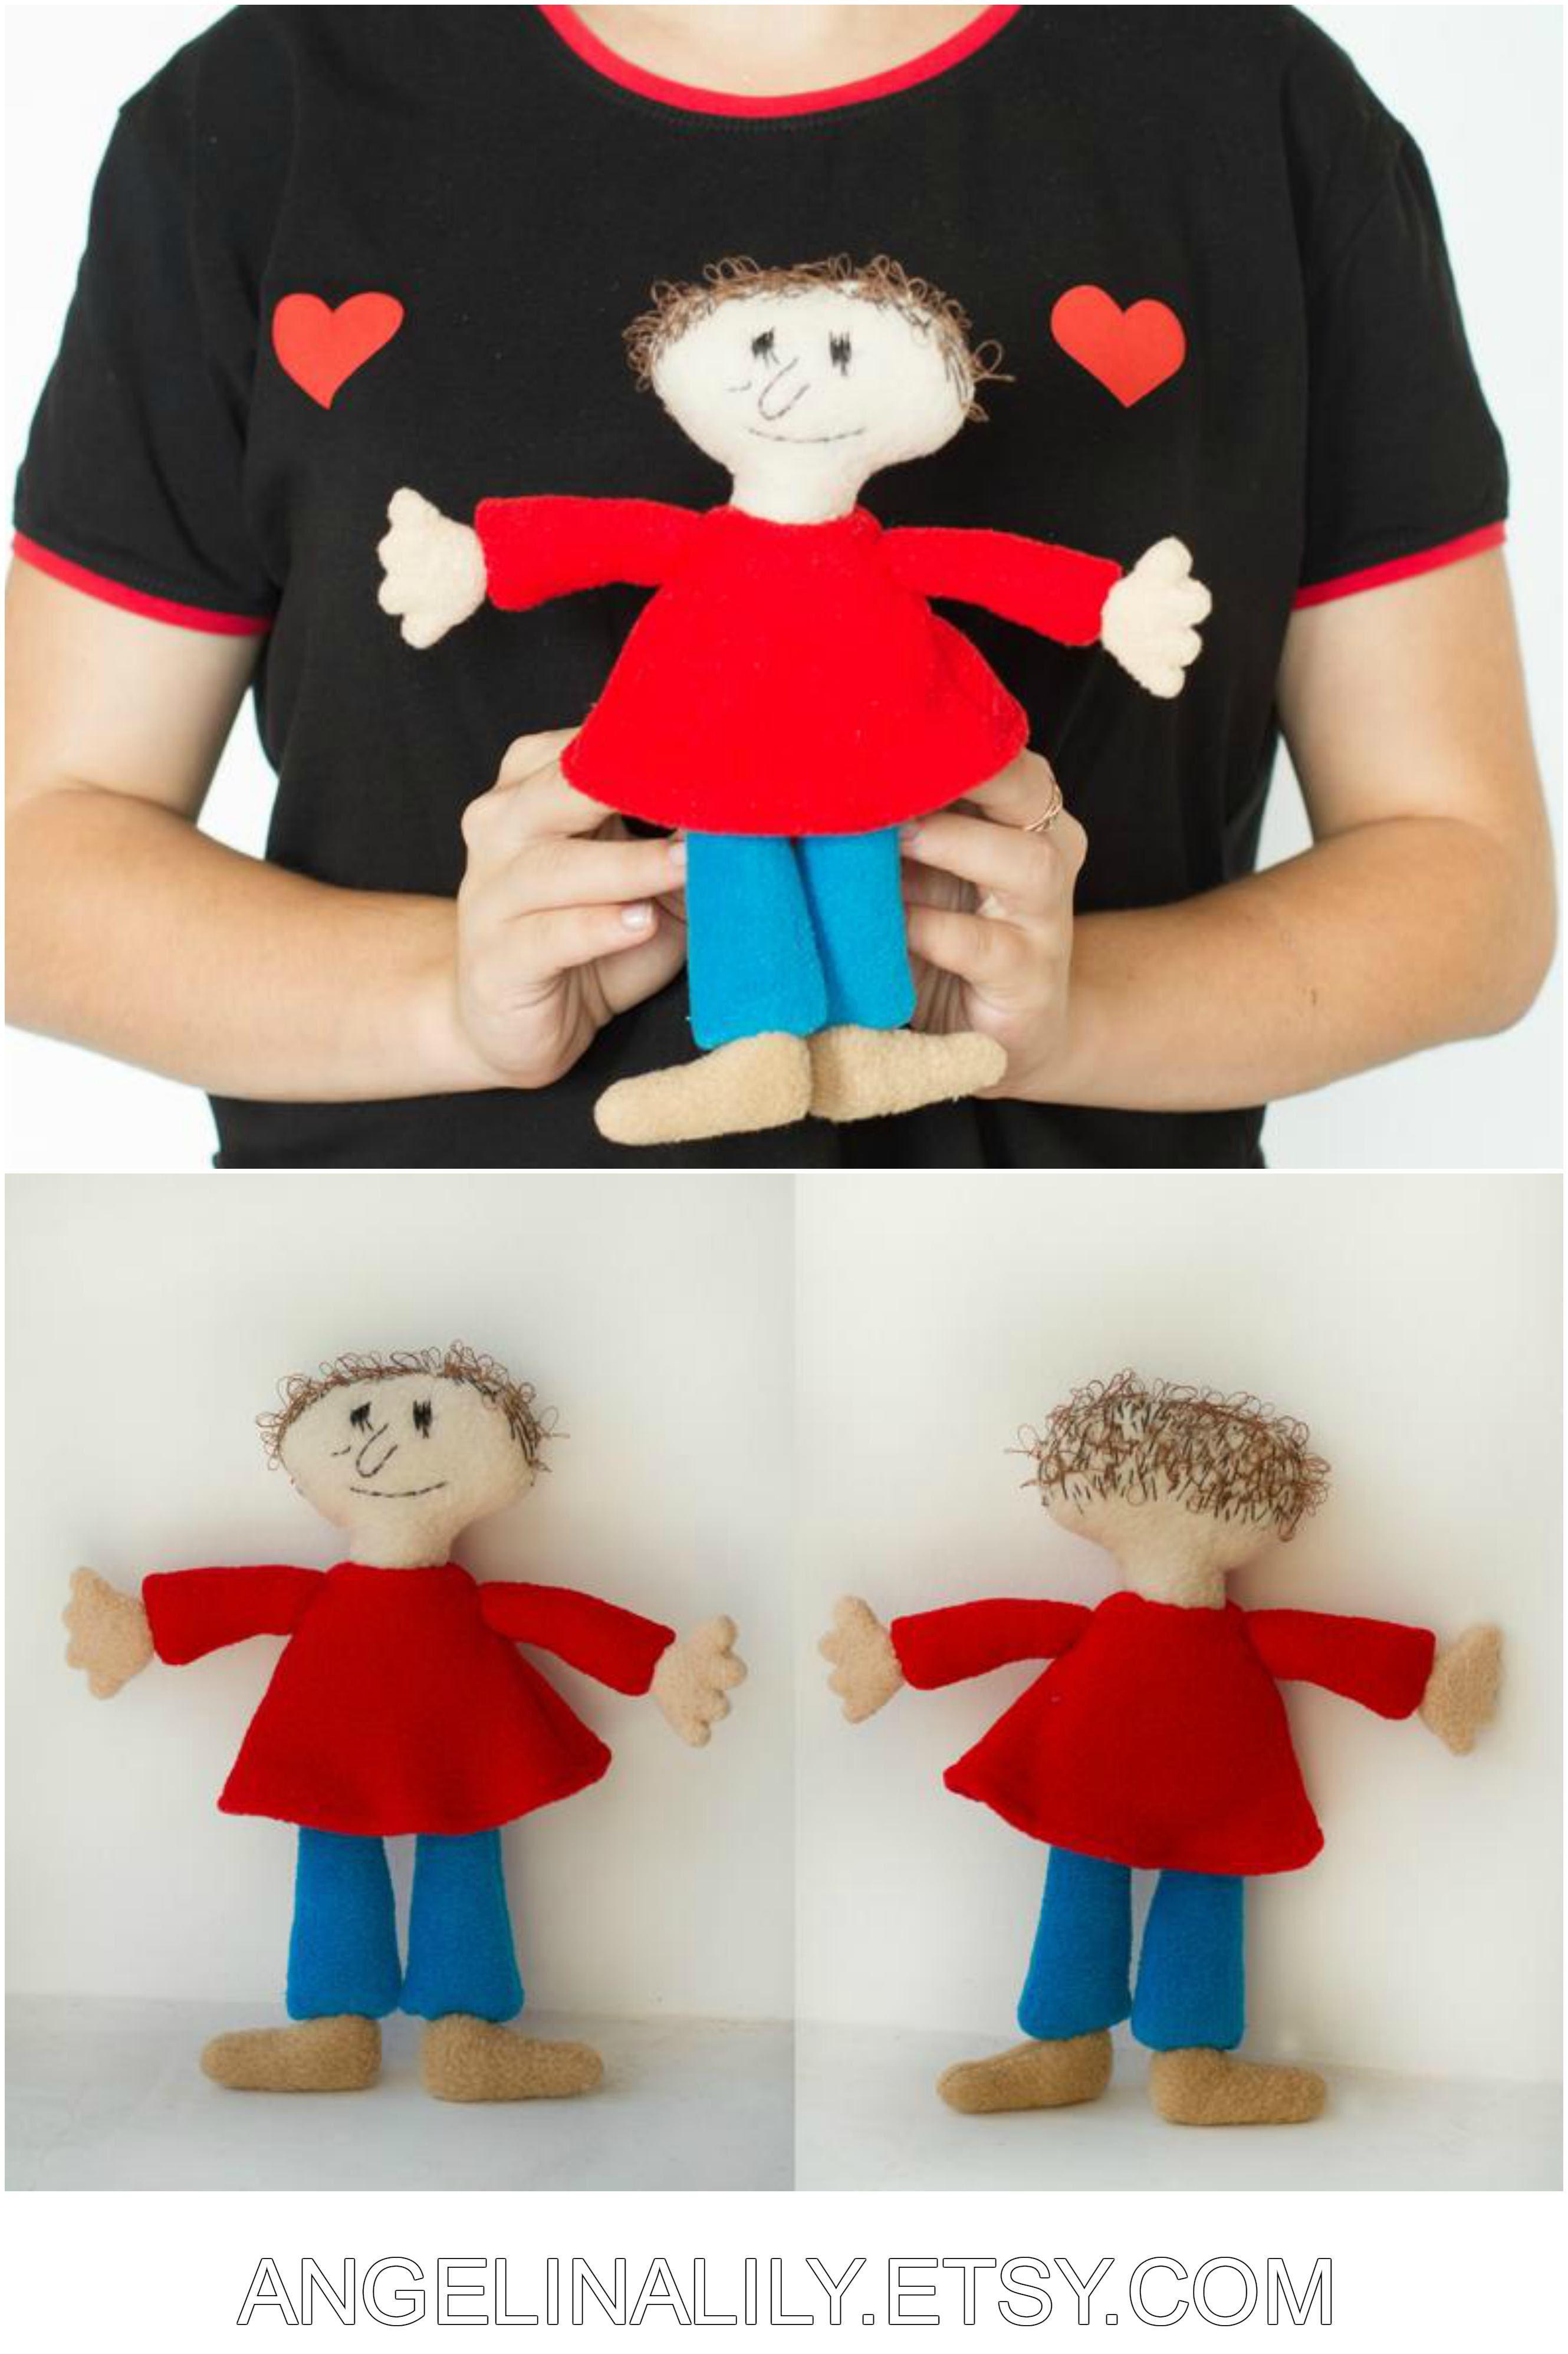 Playtime plush - handmade soft doll, 9 in high